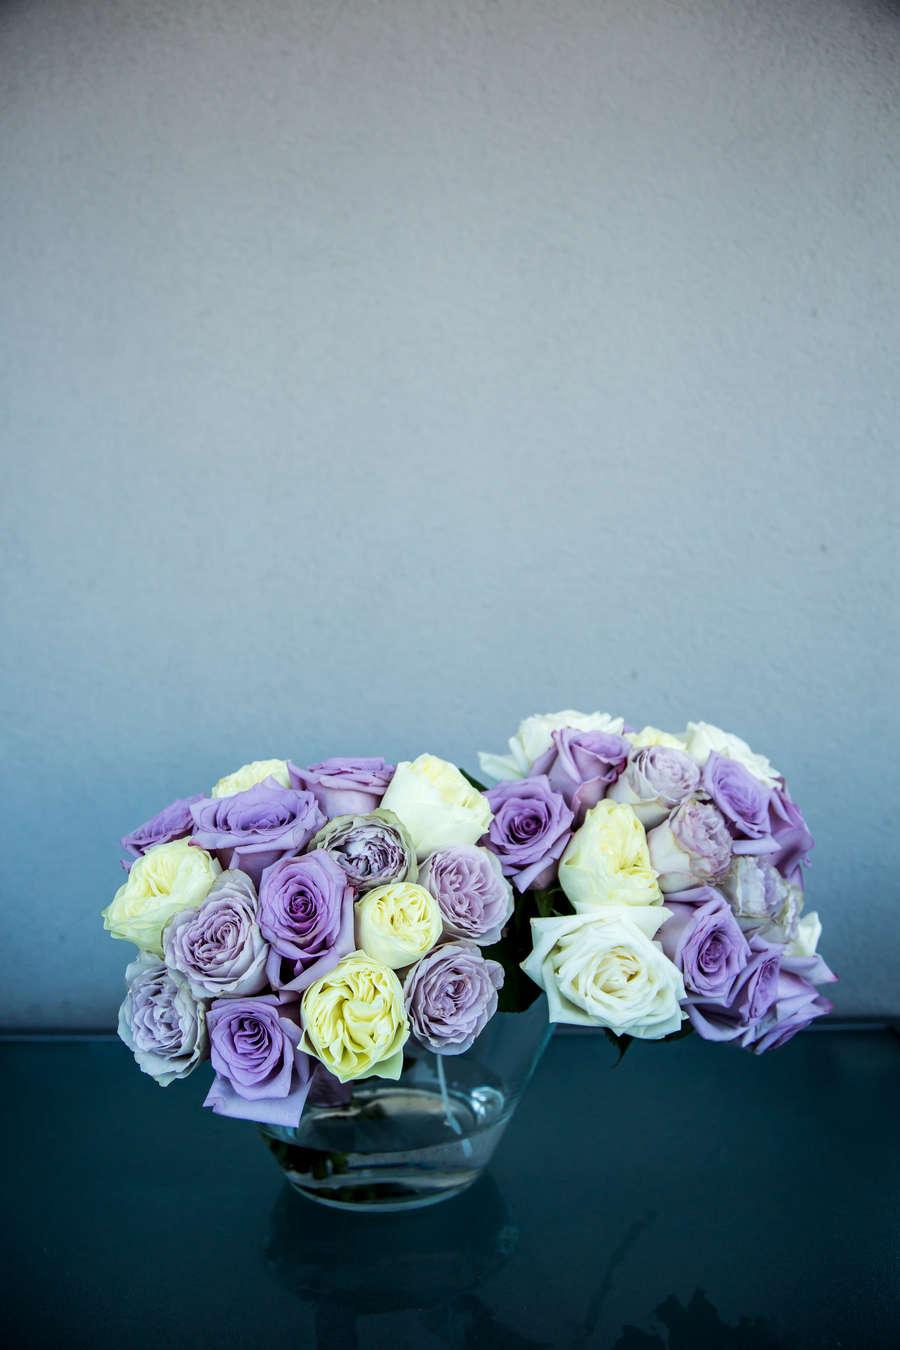 mauve yellow white wedding bouquet vase